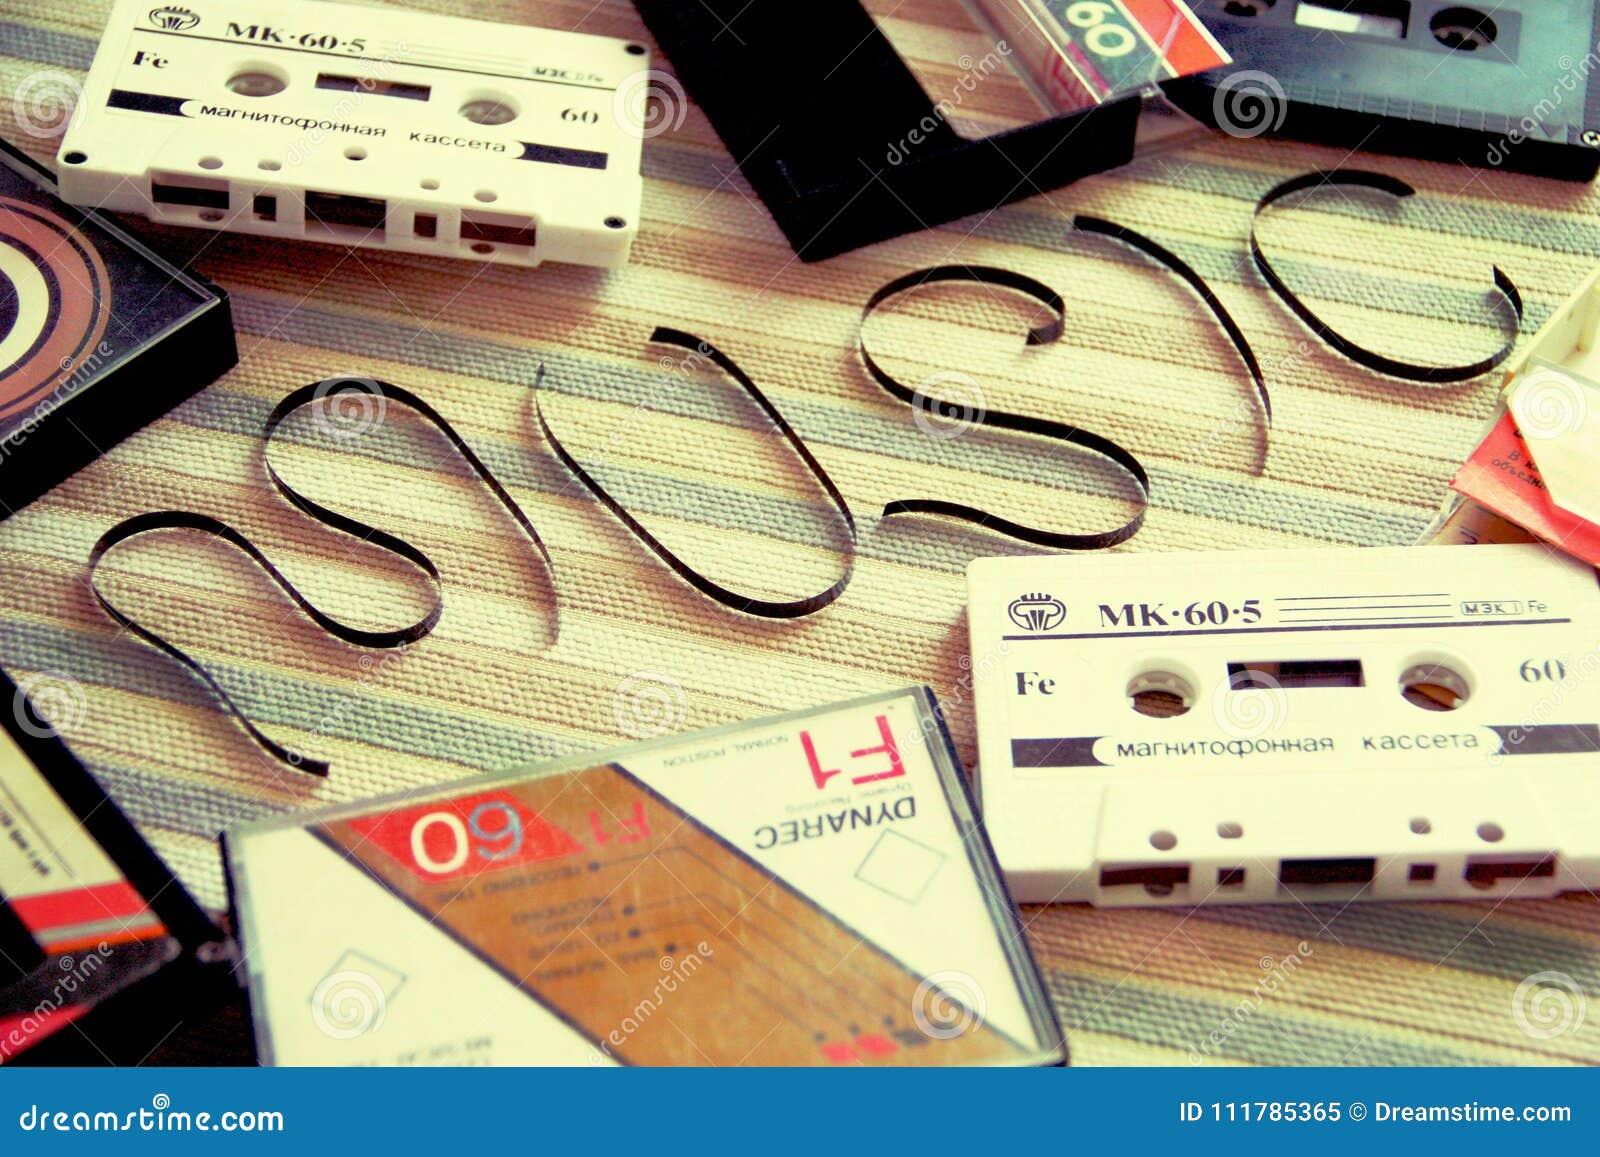 Music Tape Retro Old School Editorial Image - Image of school